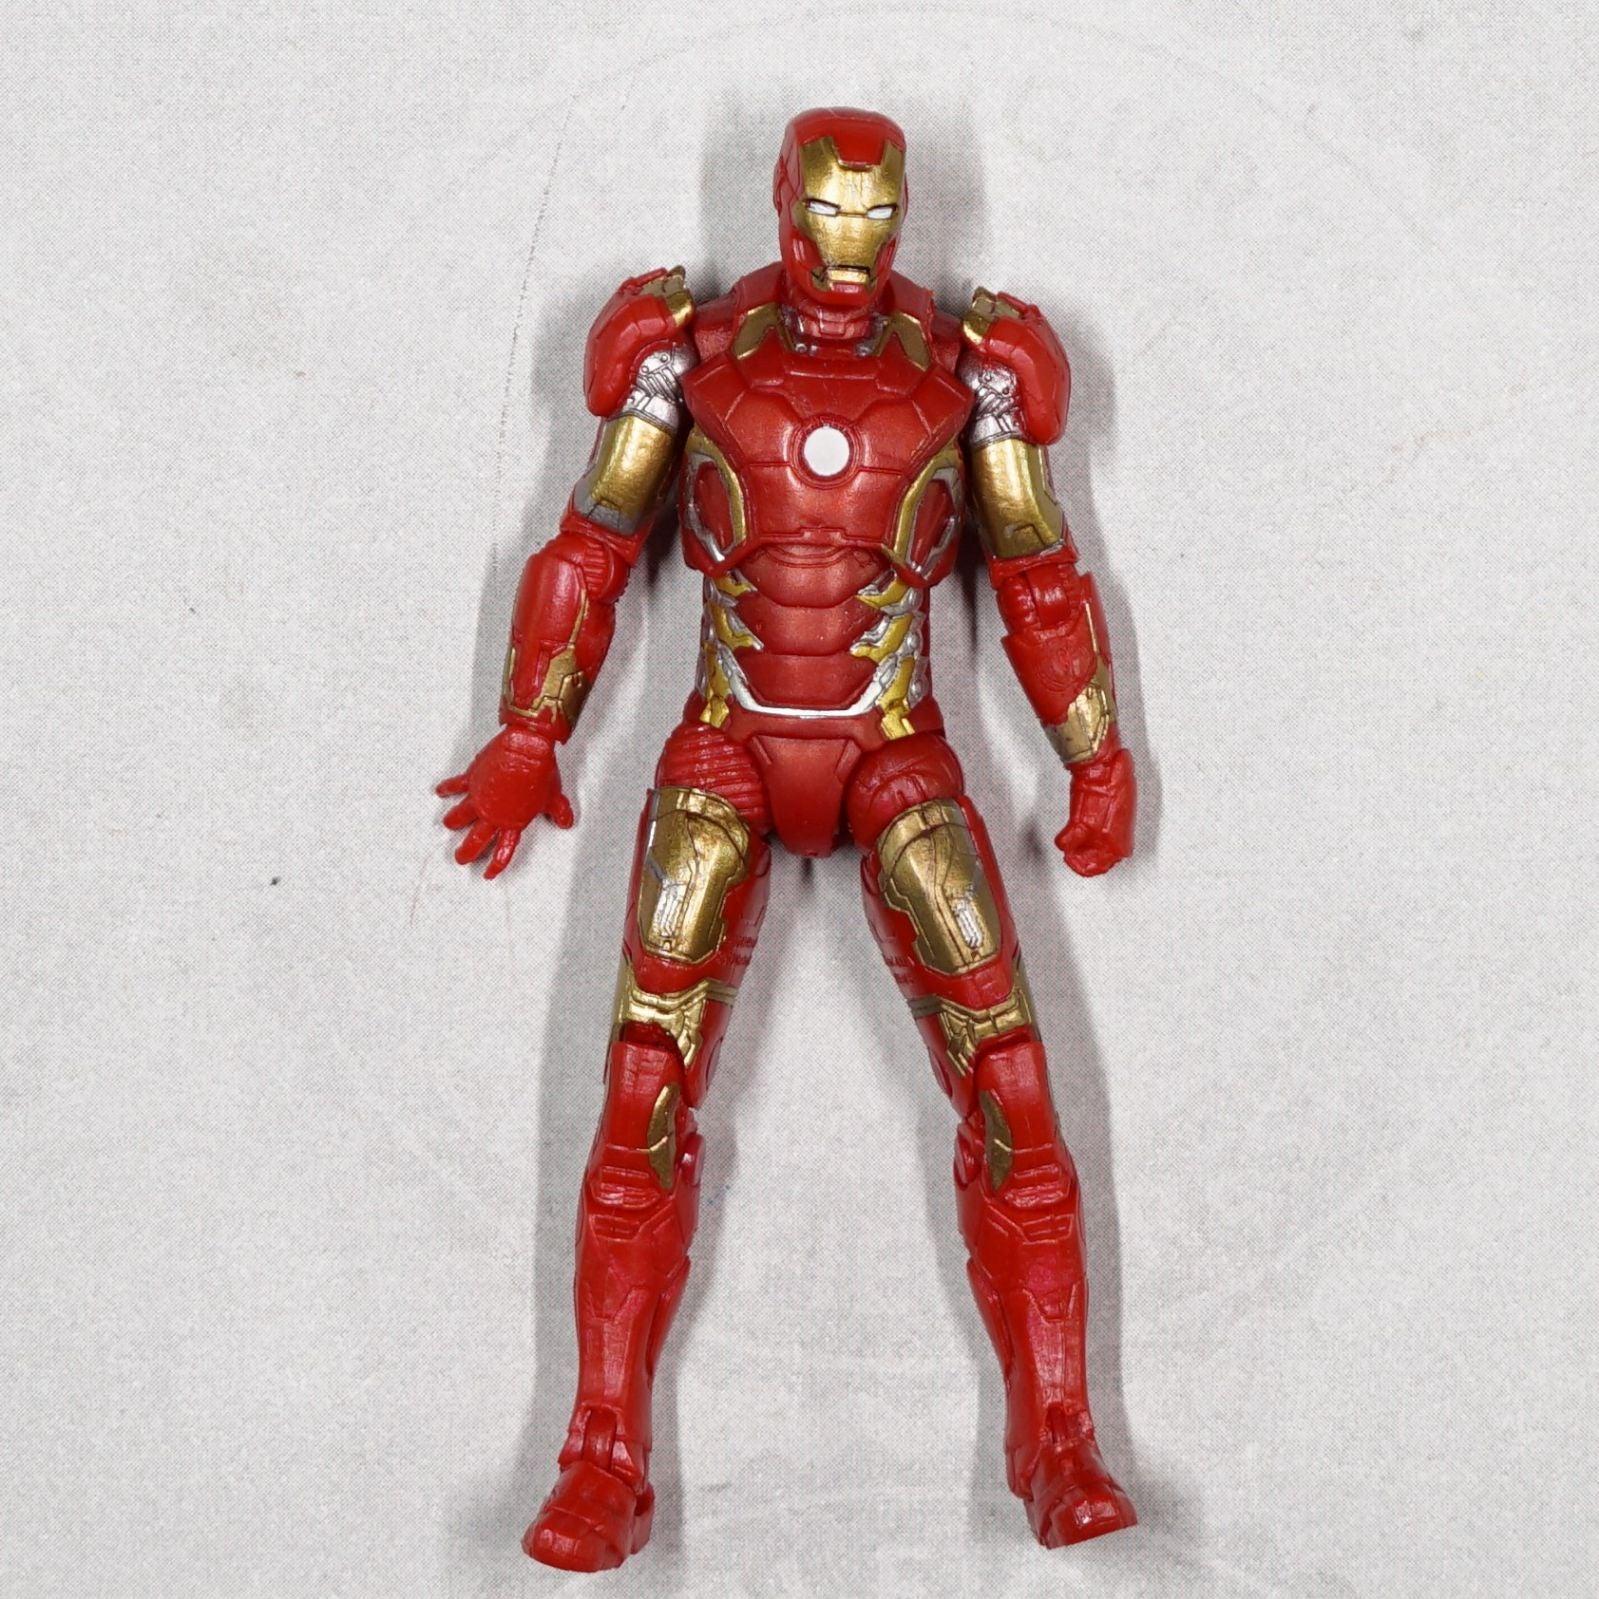 Avengers Age Of Ultron Iron Man Mk.43